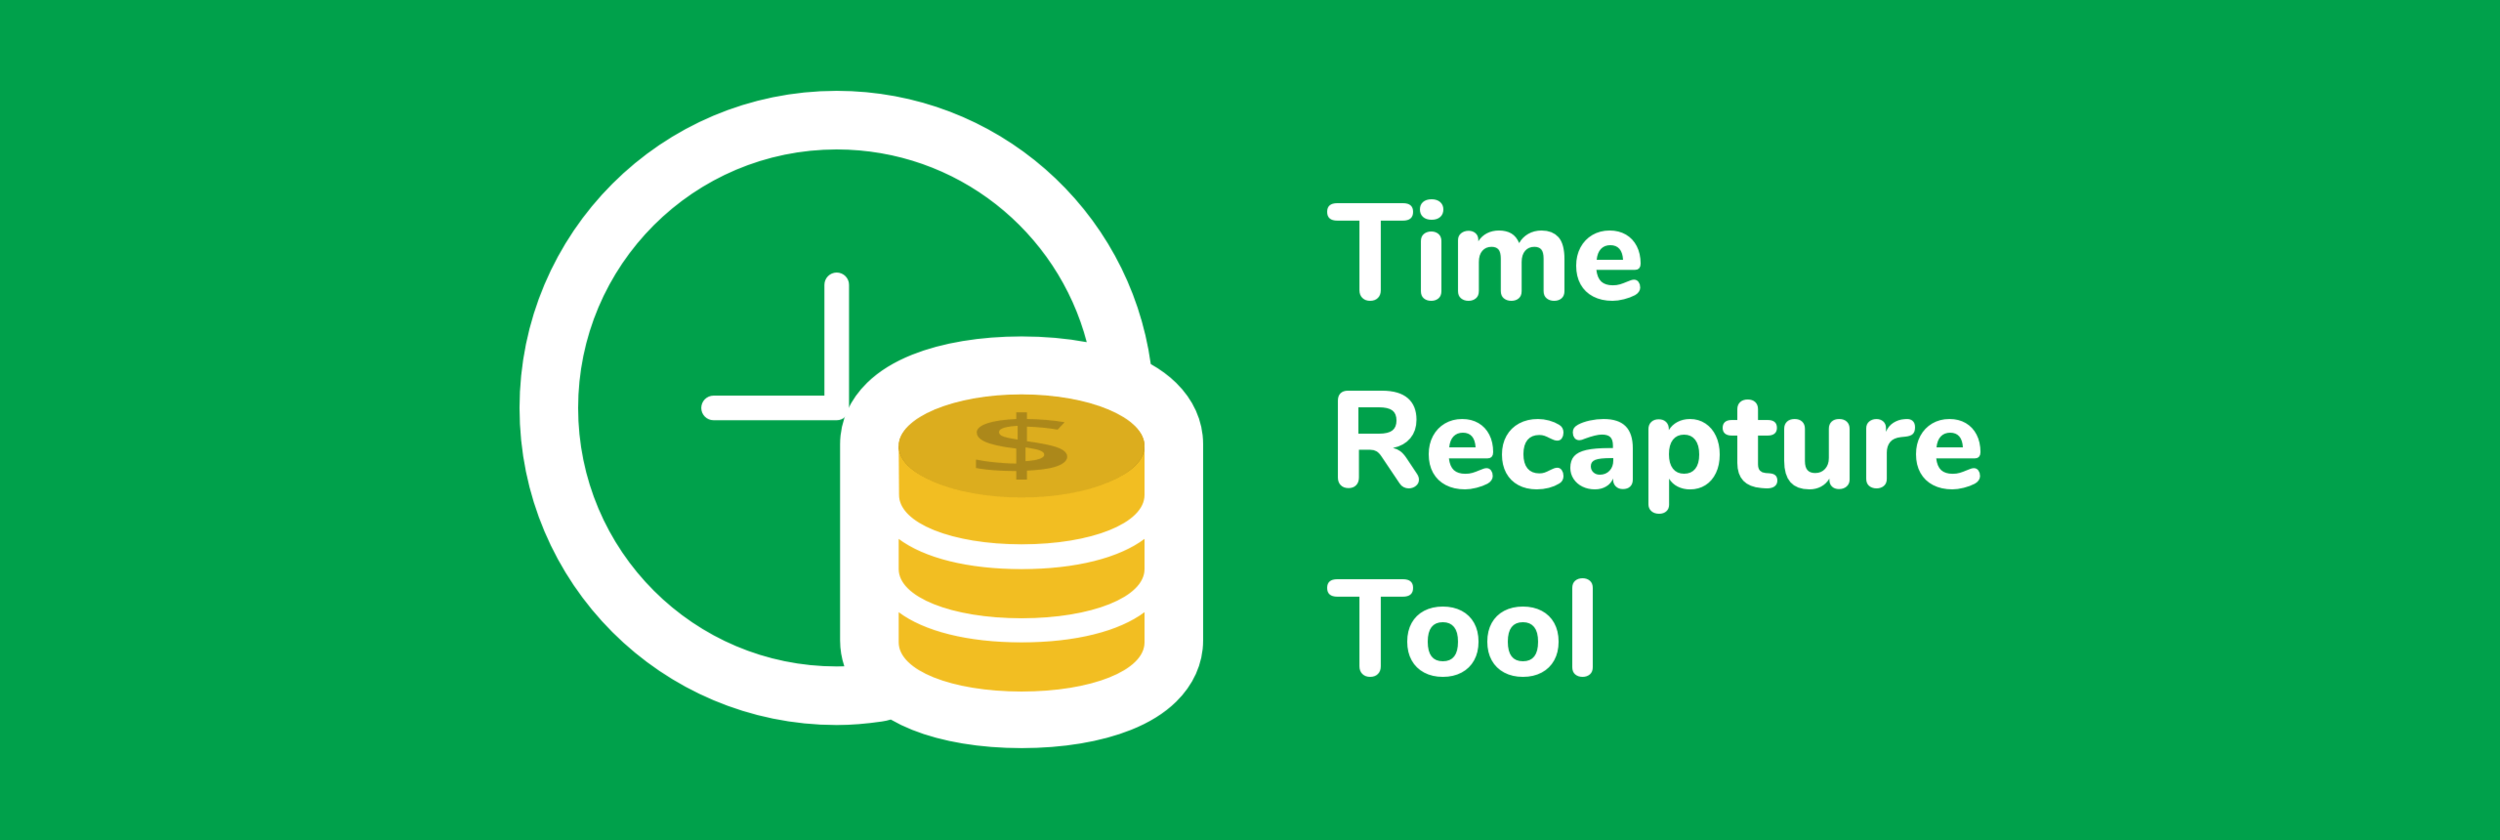 vs-web--time-recoup-tool--banner--v1.1--tiny.png